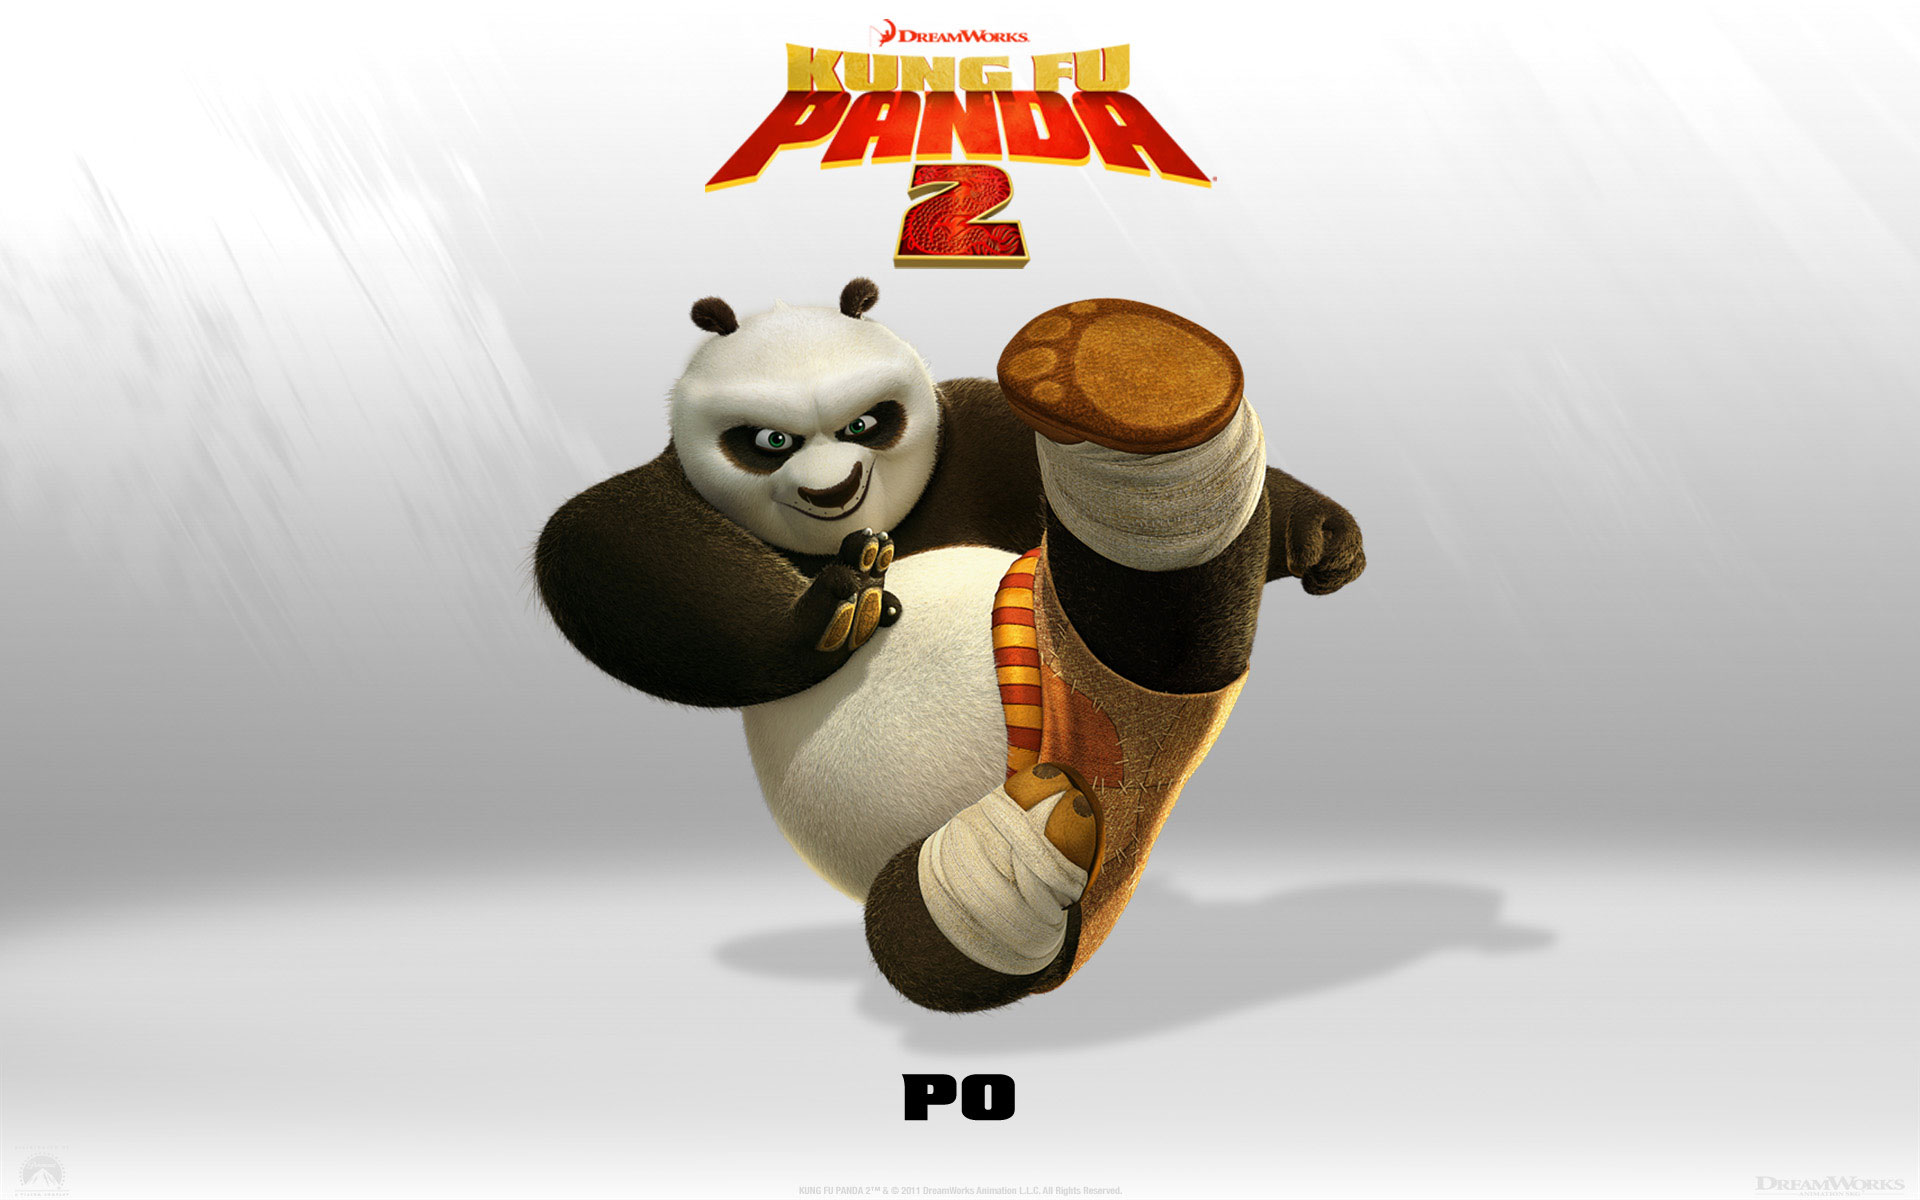 Kung Fu Panda 2 Wallpaper